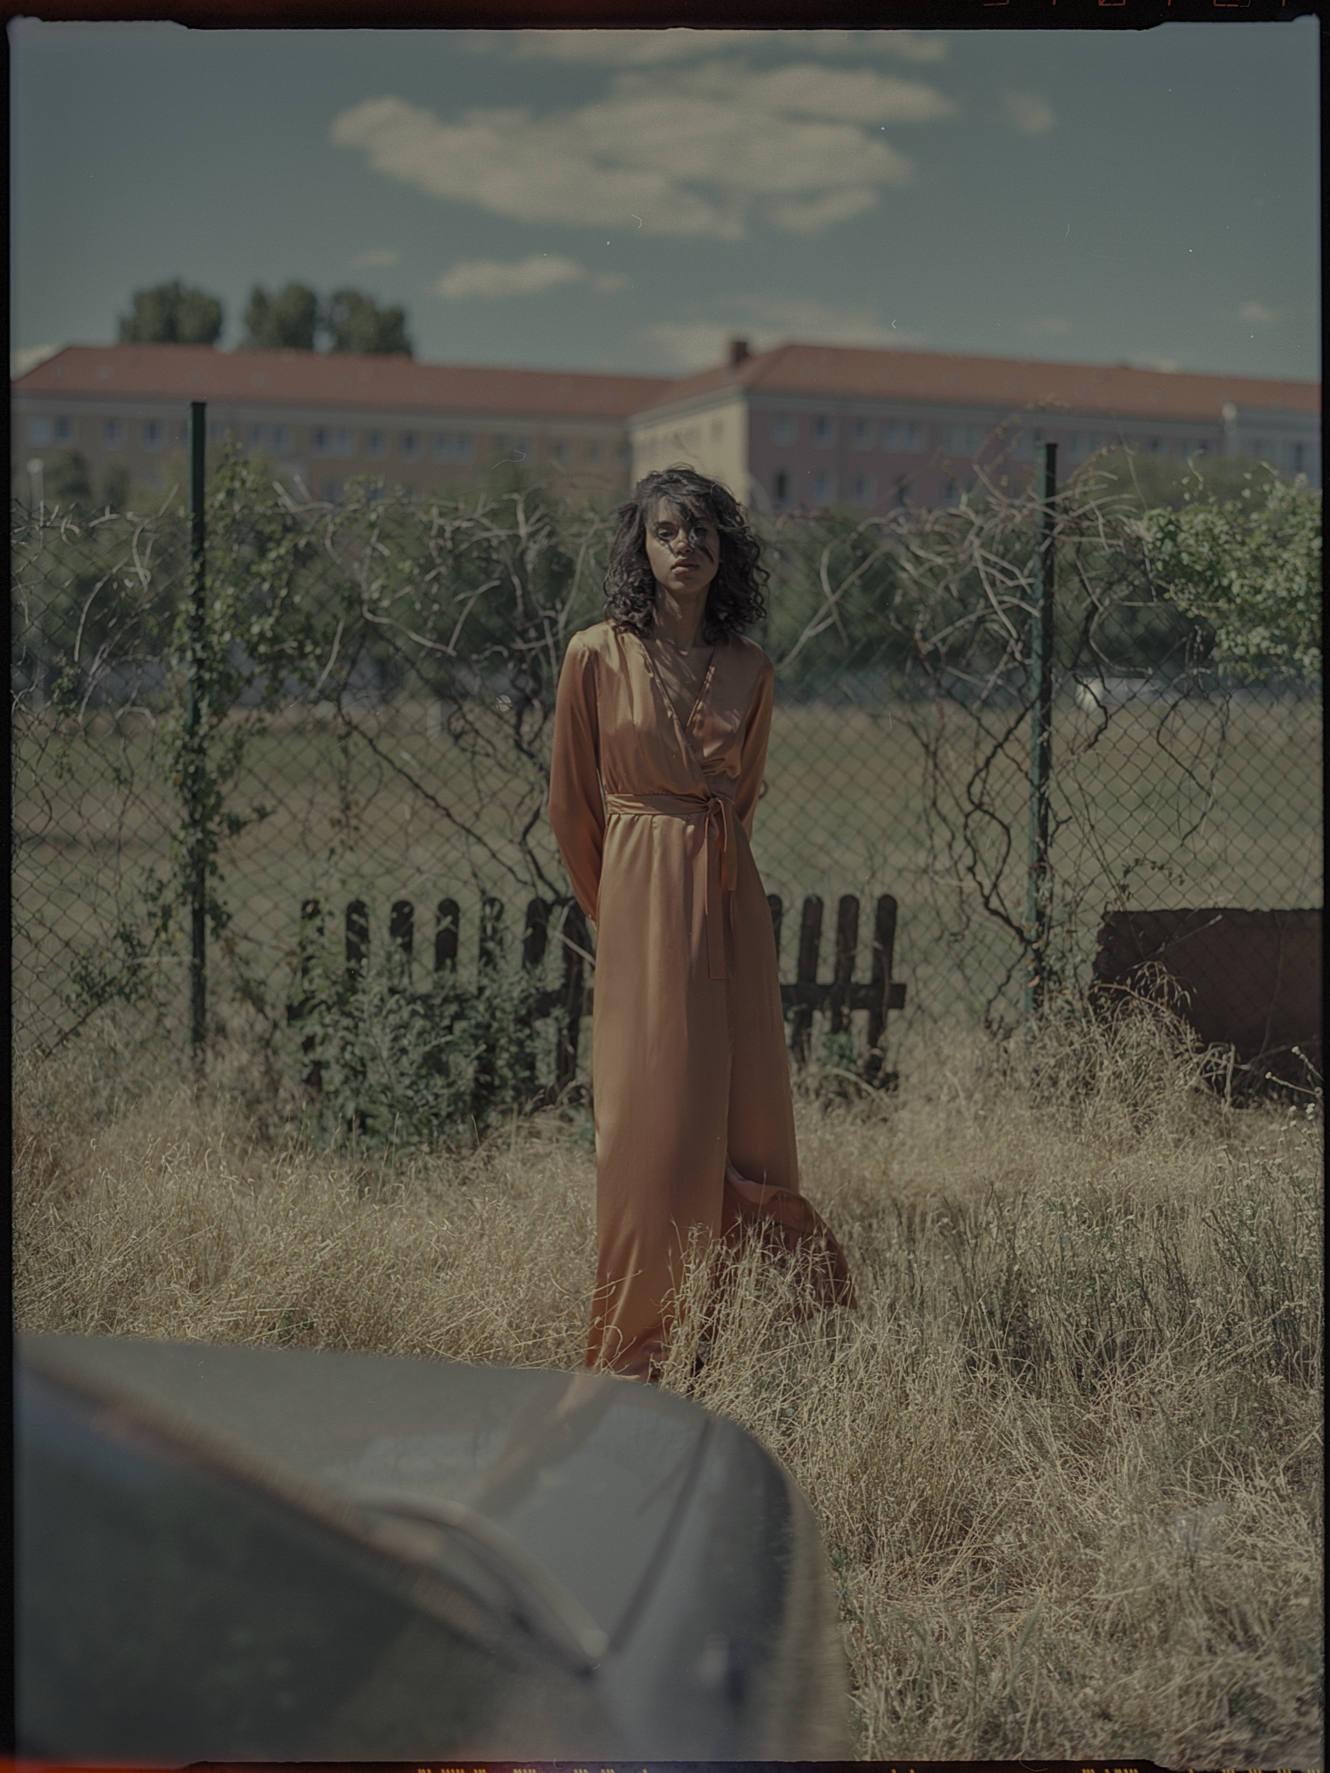 Cus Barcelona, Sanika, Nadja Kiess, Comme des Costumes, ReSustain, Harolds, Graciela Huam, Lana Organics